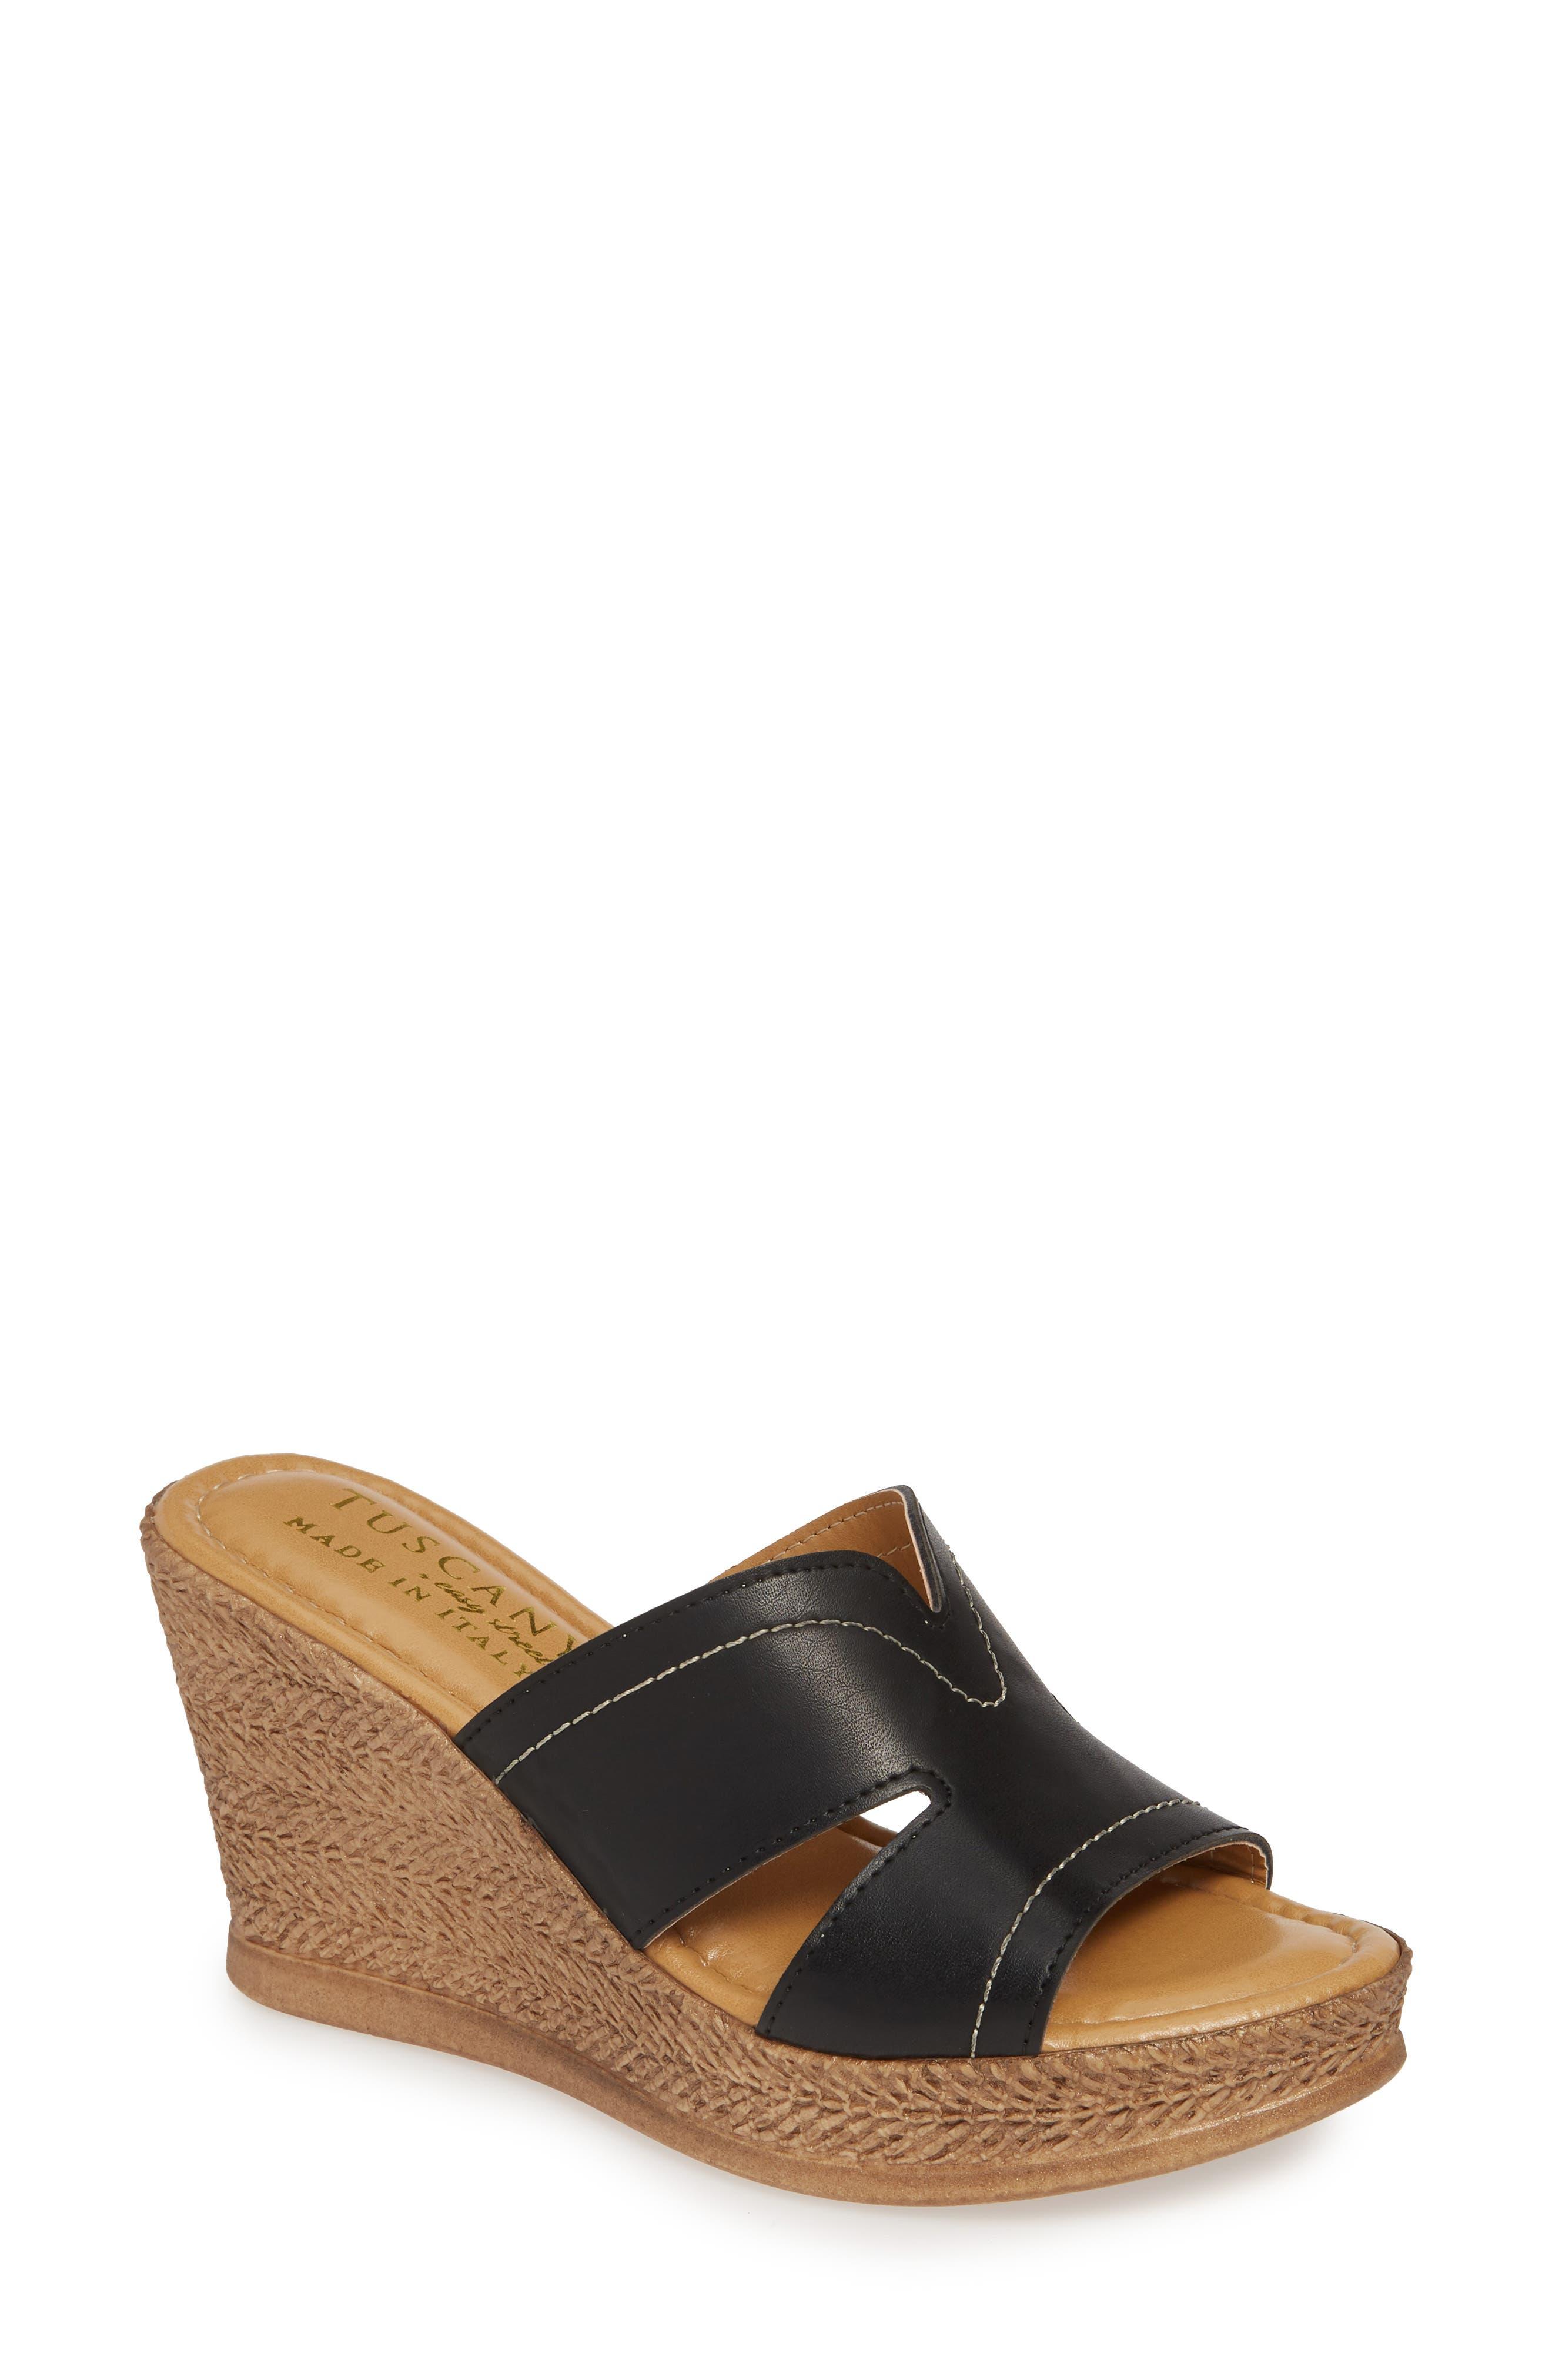 Marsala Sandal, Main, color, BLACK LEATHER